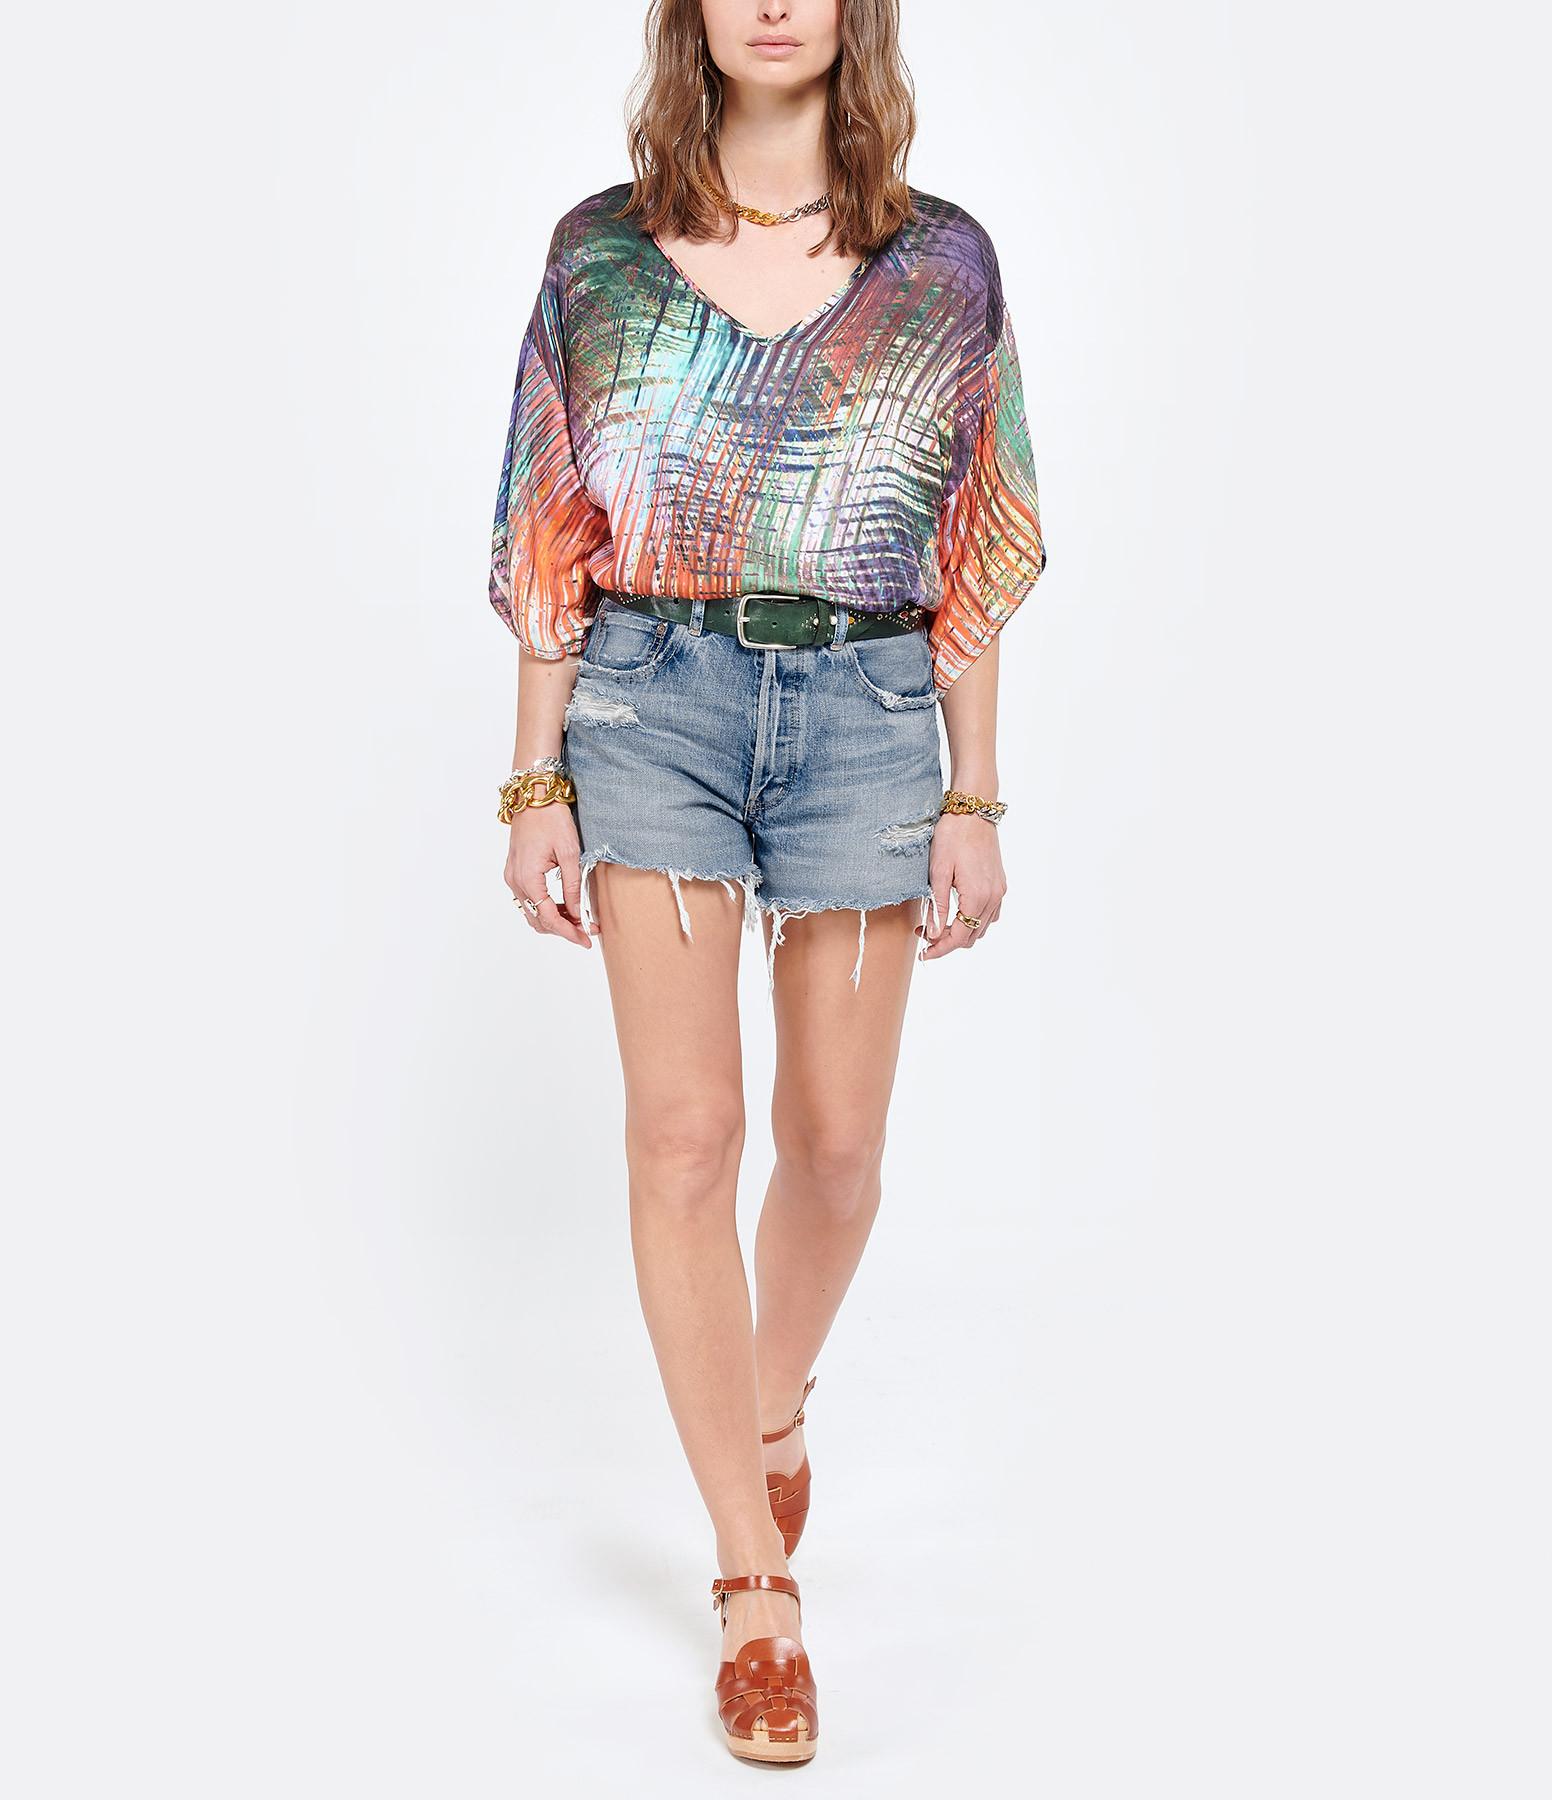 MAEVY - Tee-shirt Mimosaprint Imprimé Multicolore